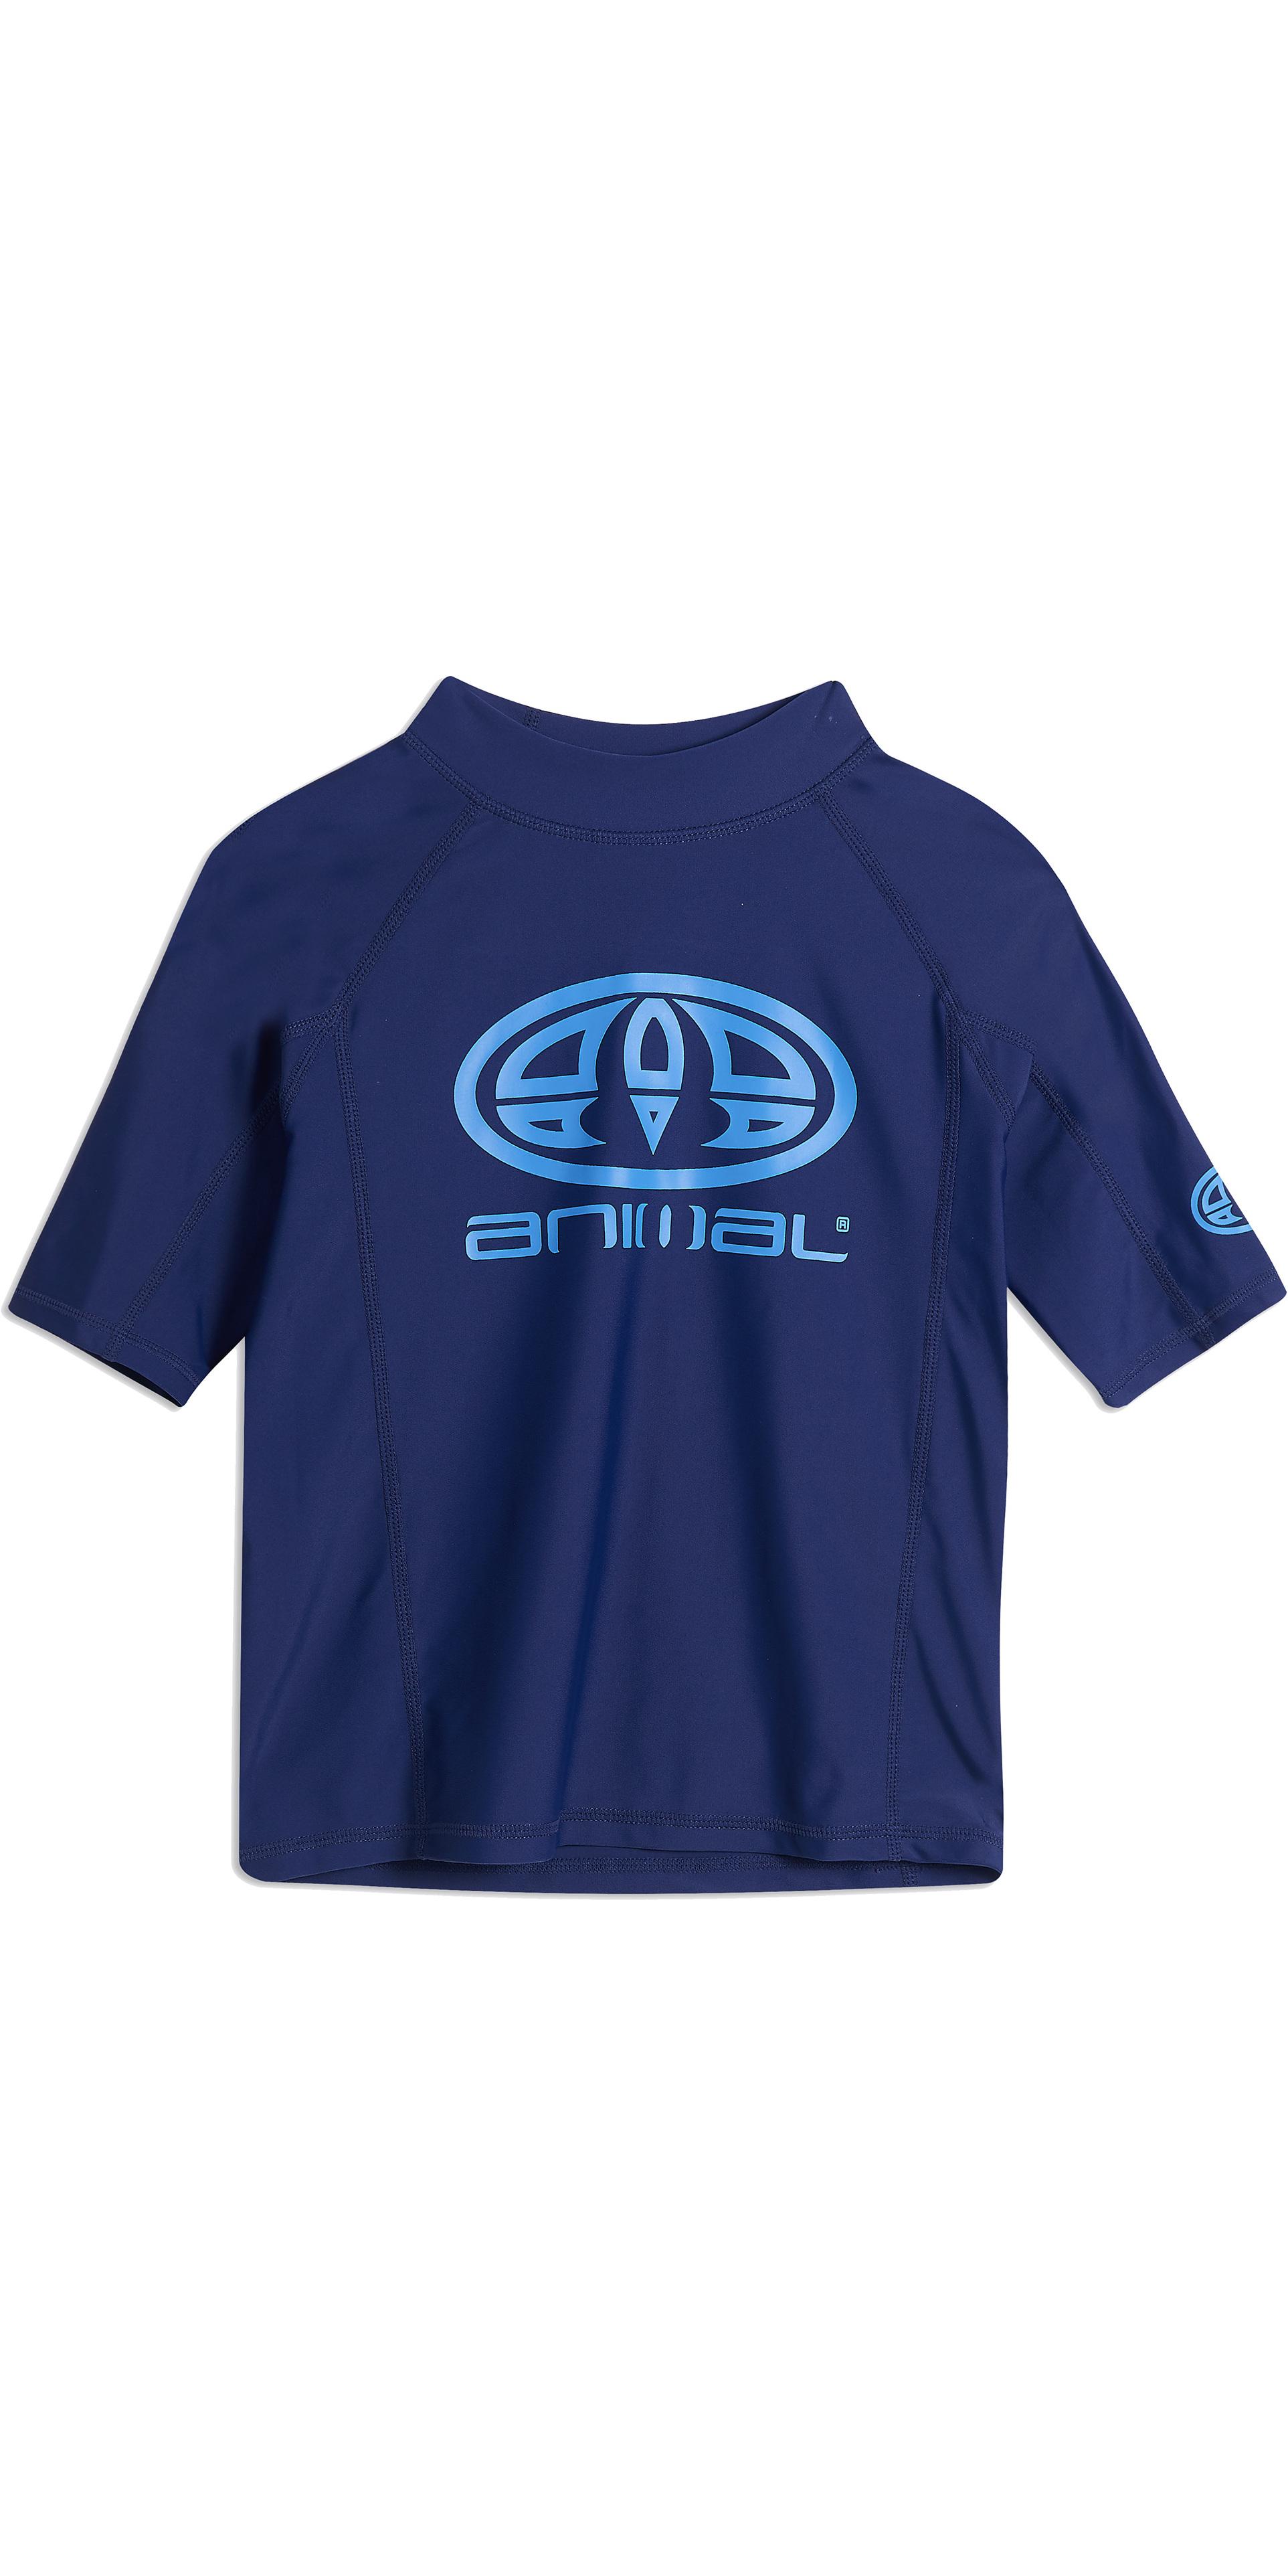 cf8951b68c 2019 Animal Junior Boys Hiltern Short Sleeve Rash Vest Nautical Blue  Cl9sq610 - Short | Wetsuit Outlet